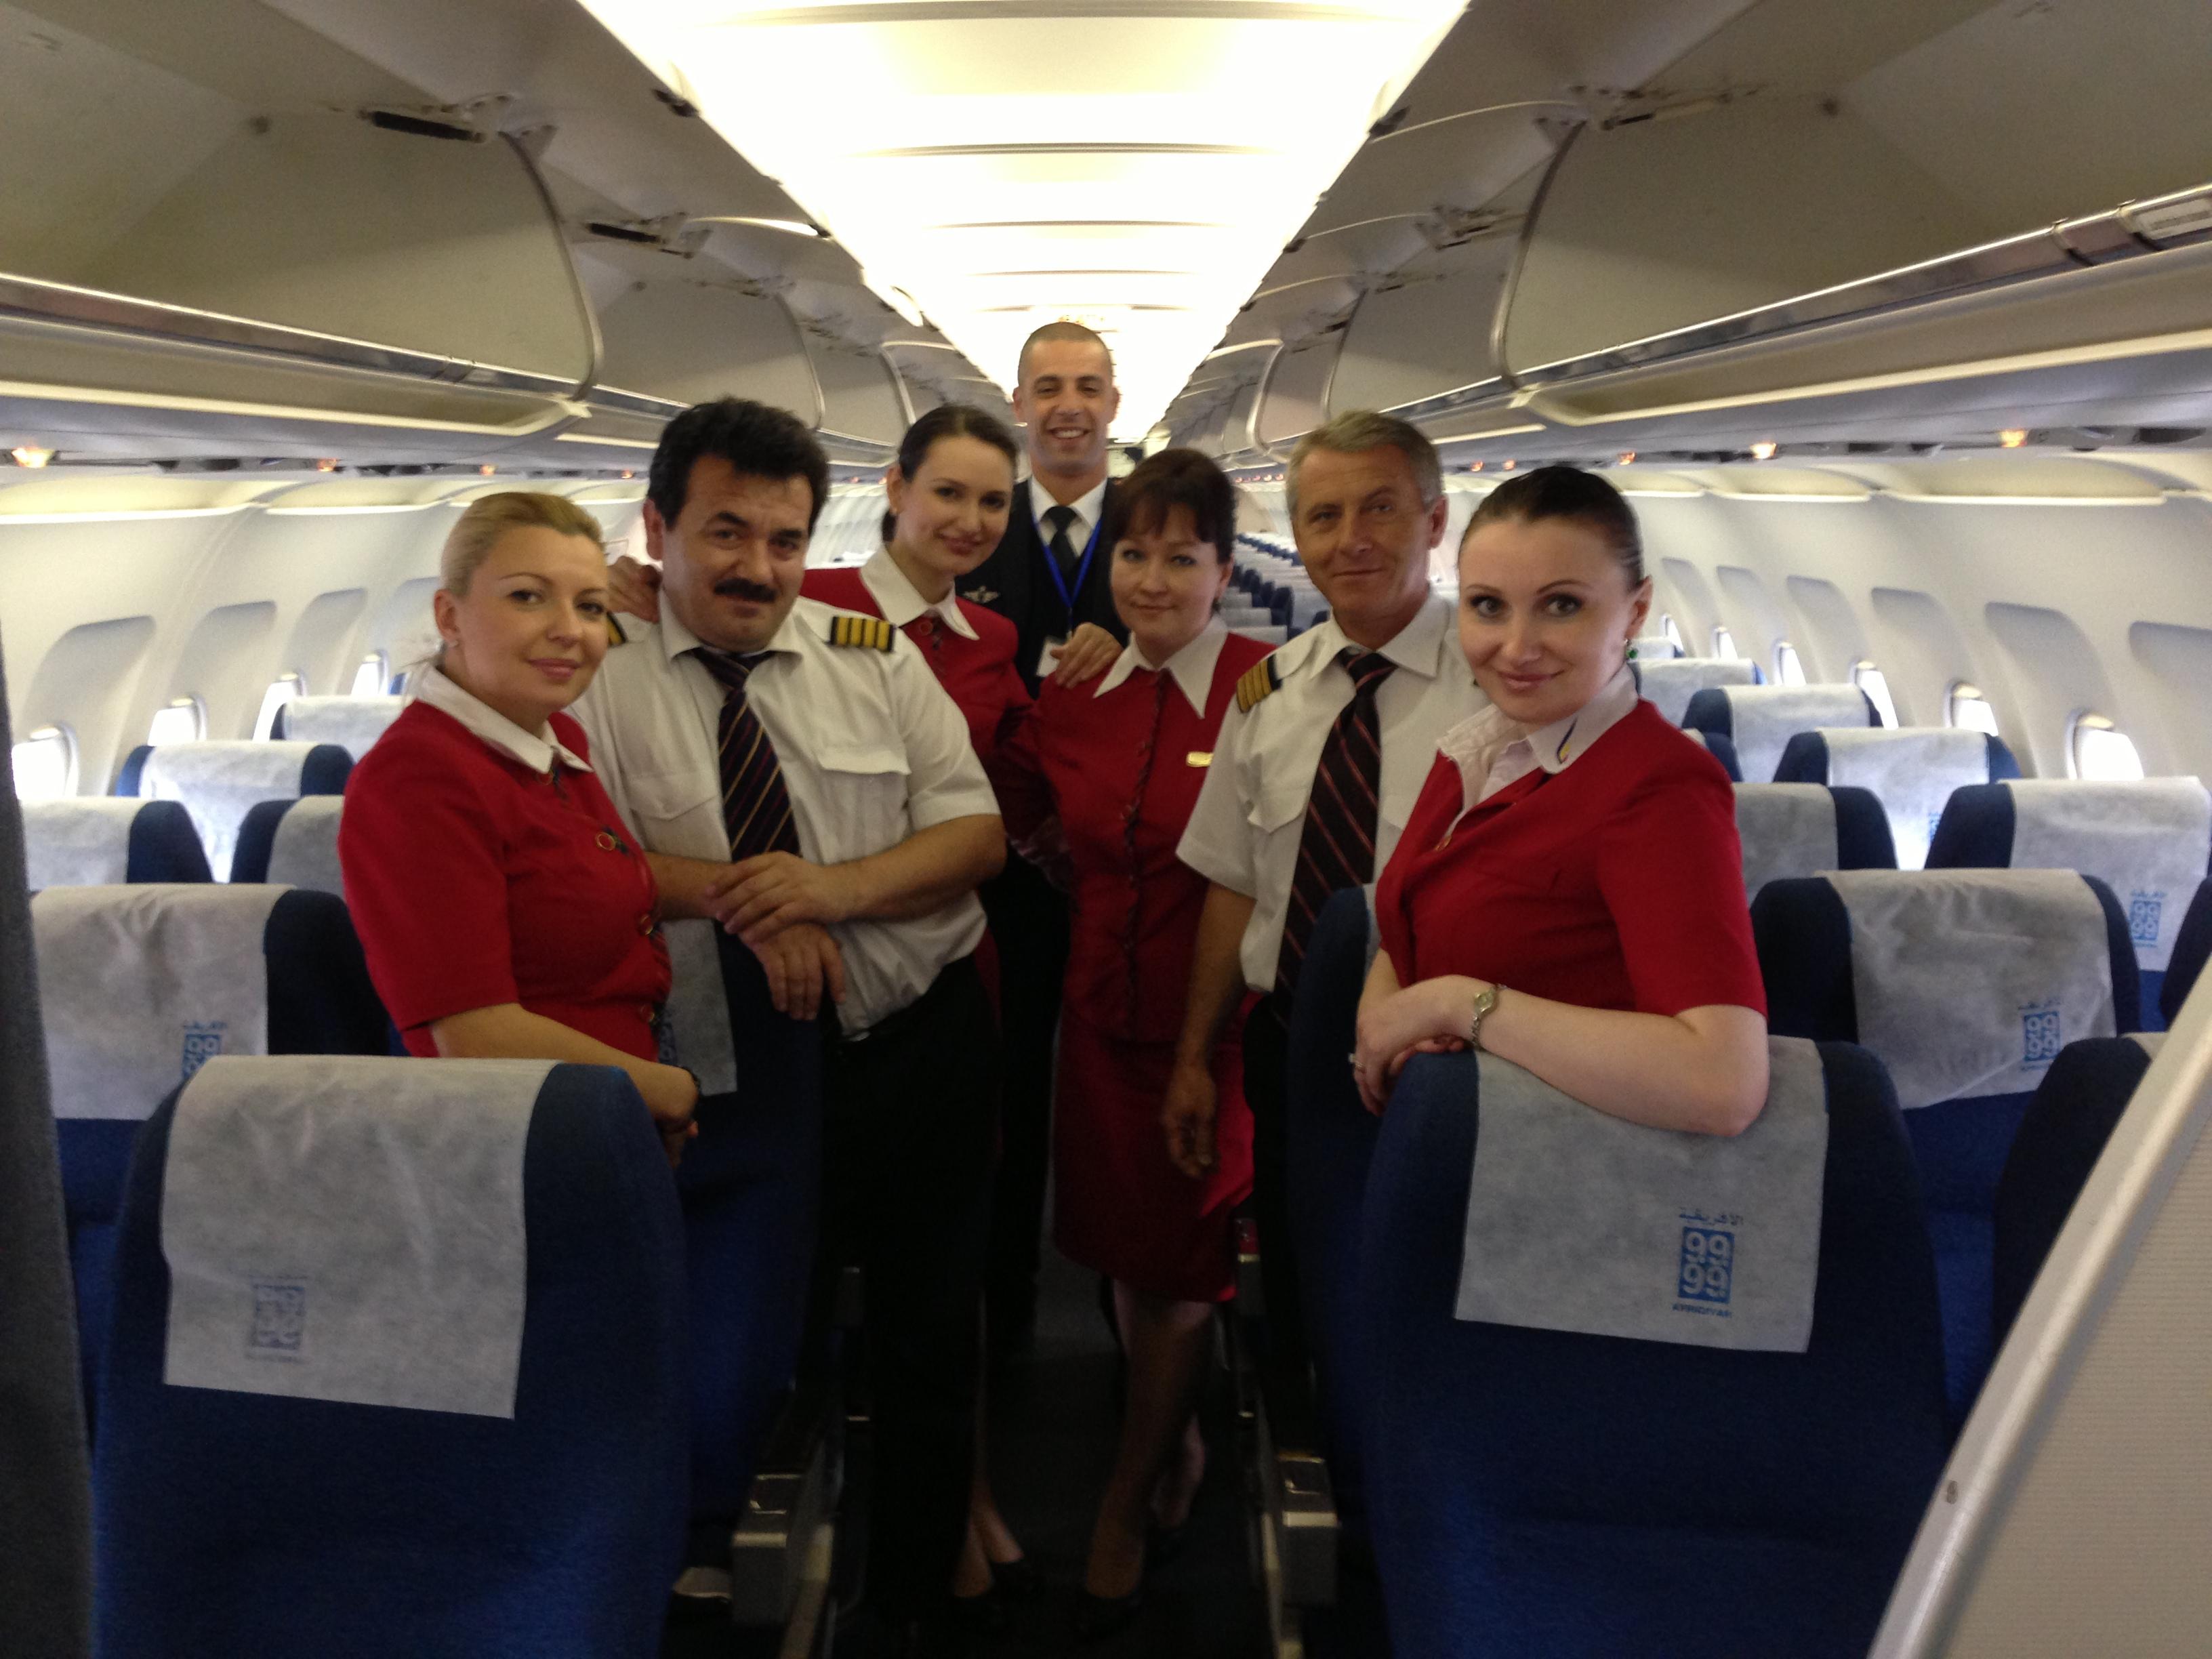 Air Moldova Crew